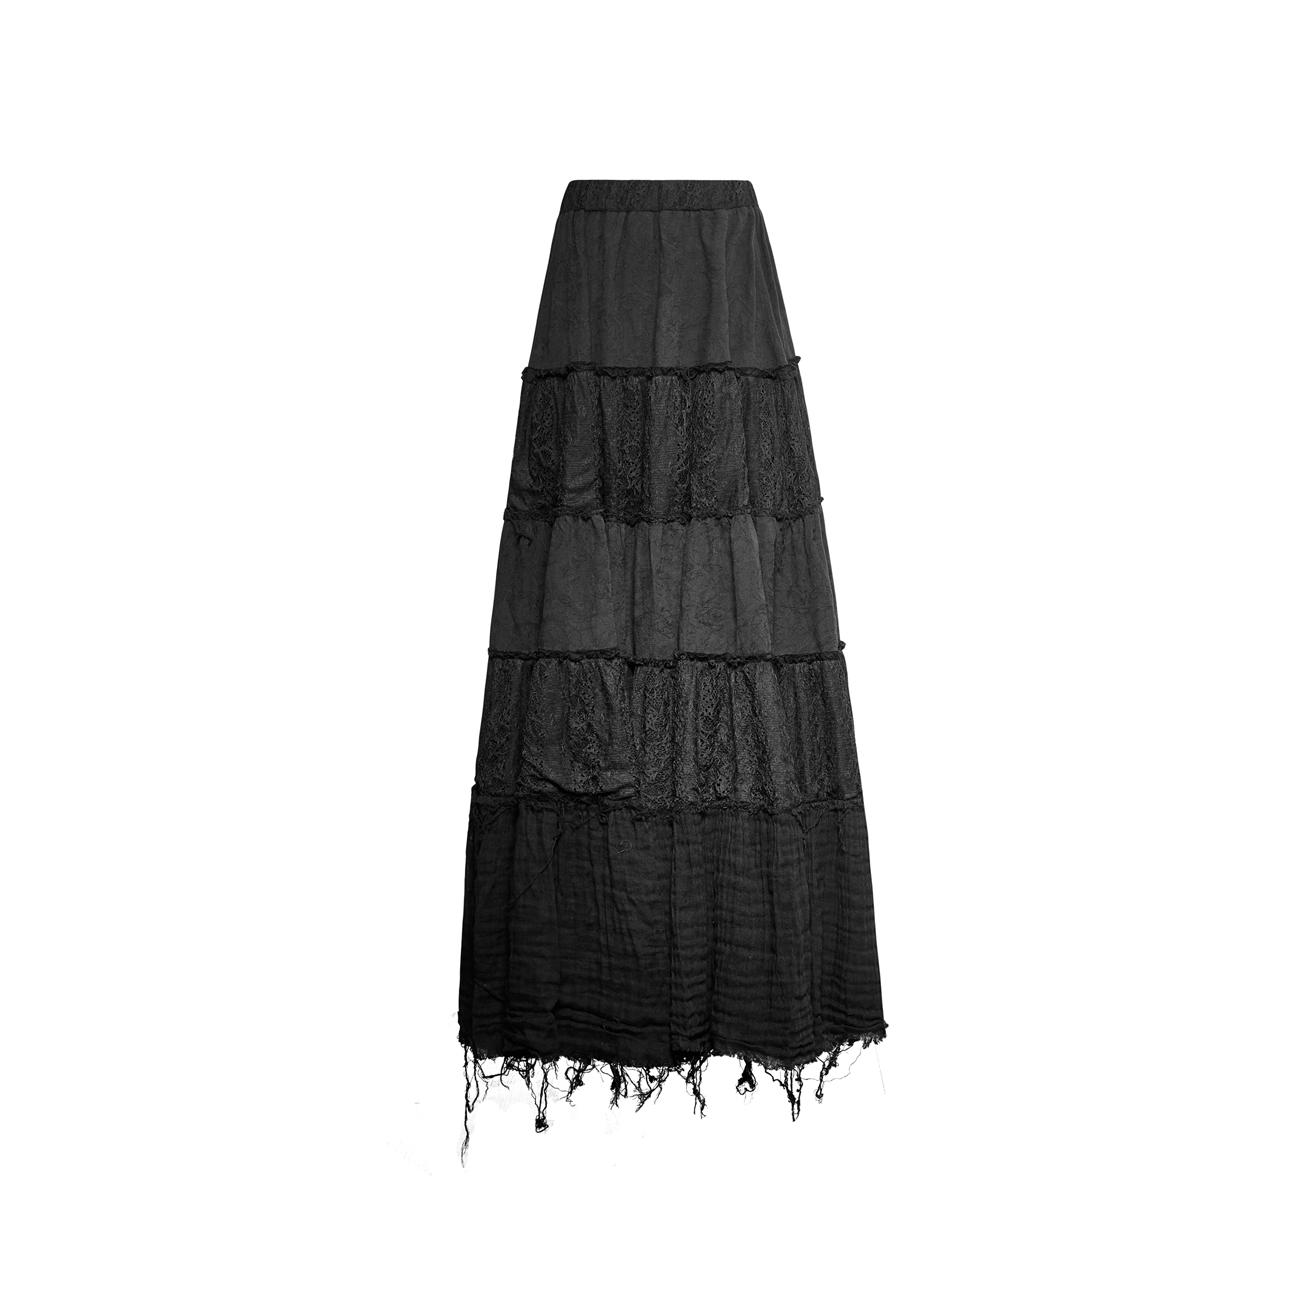 new concept e6409 61f0e WITCHCRAFT SKIRT: langer schwarzer Rock